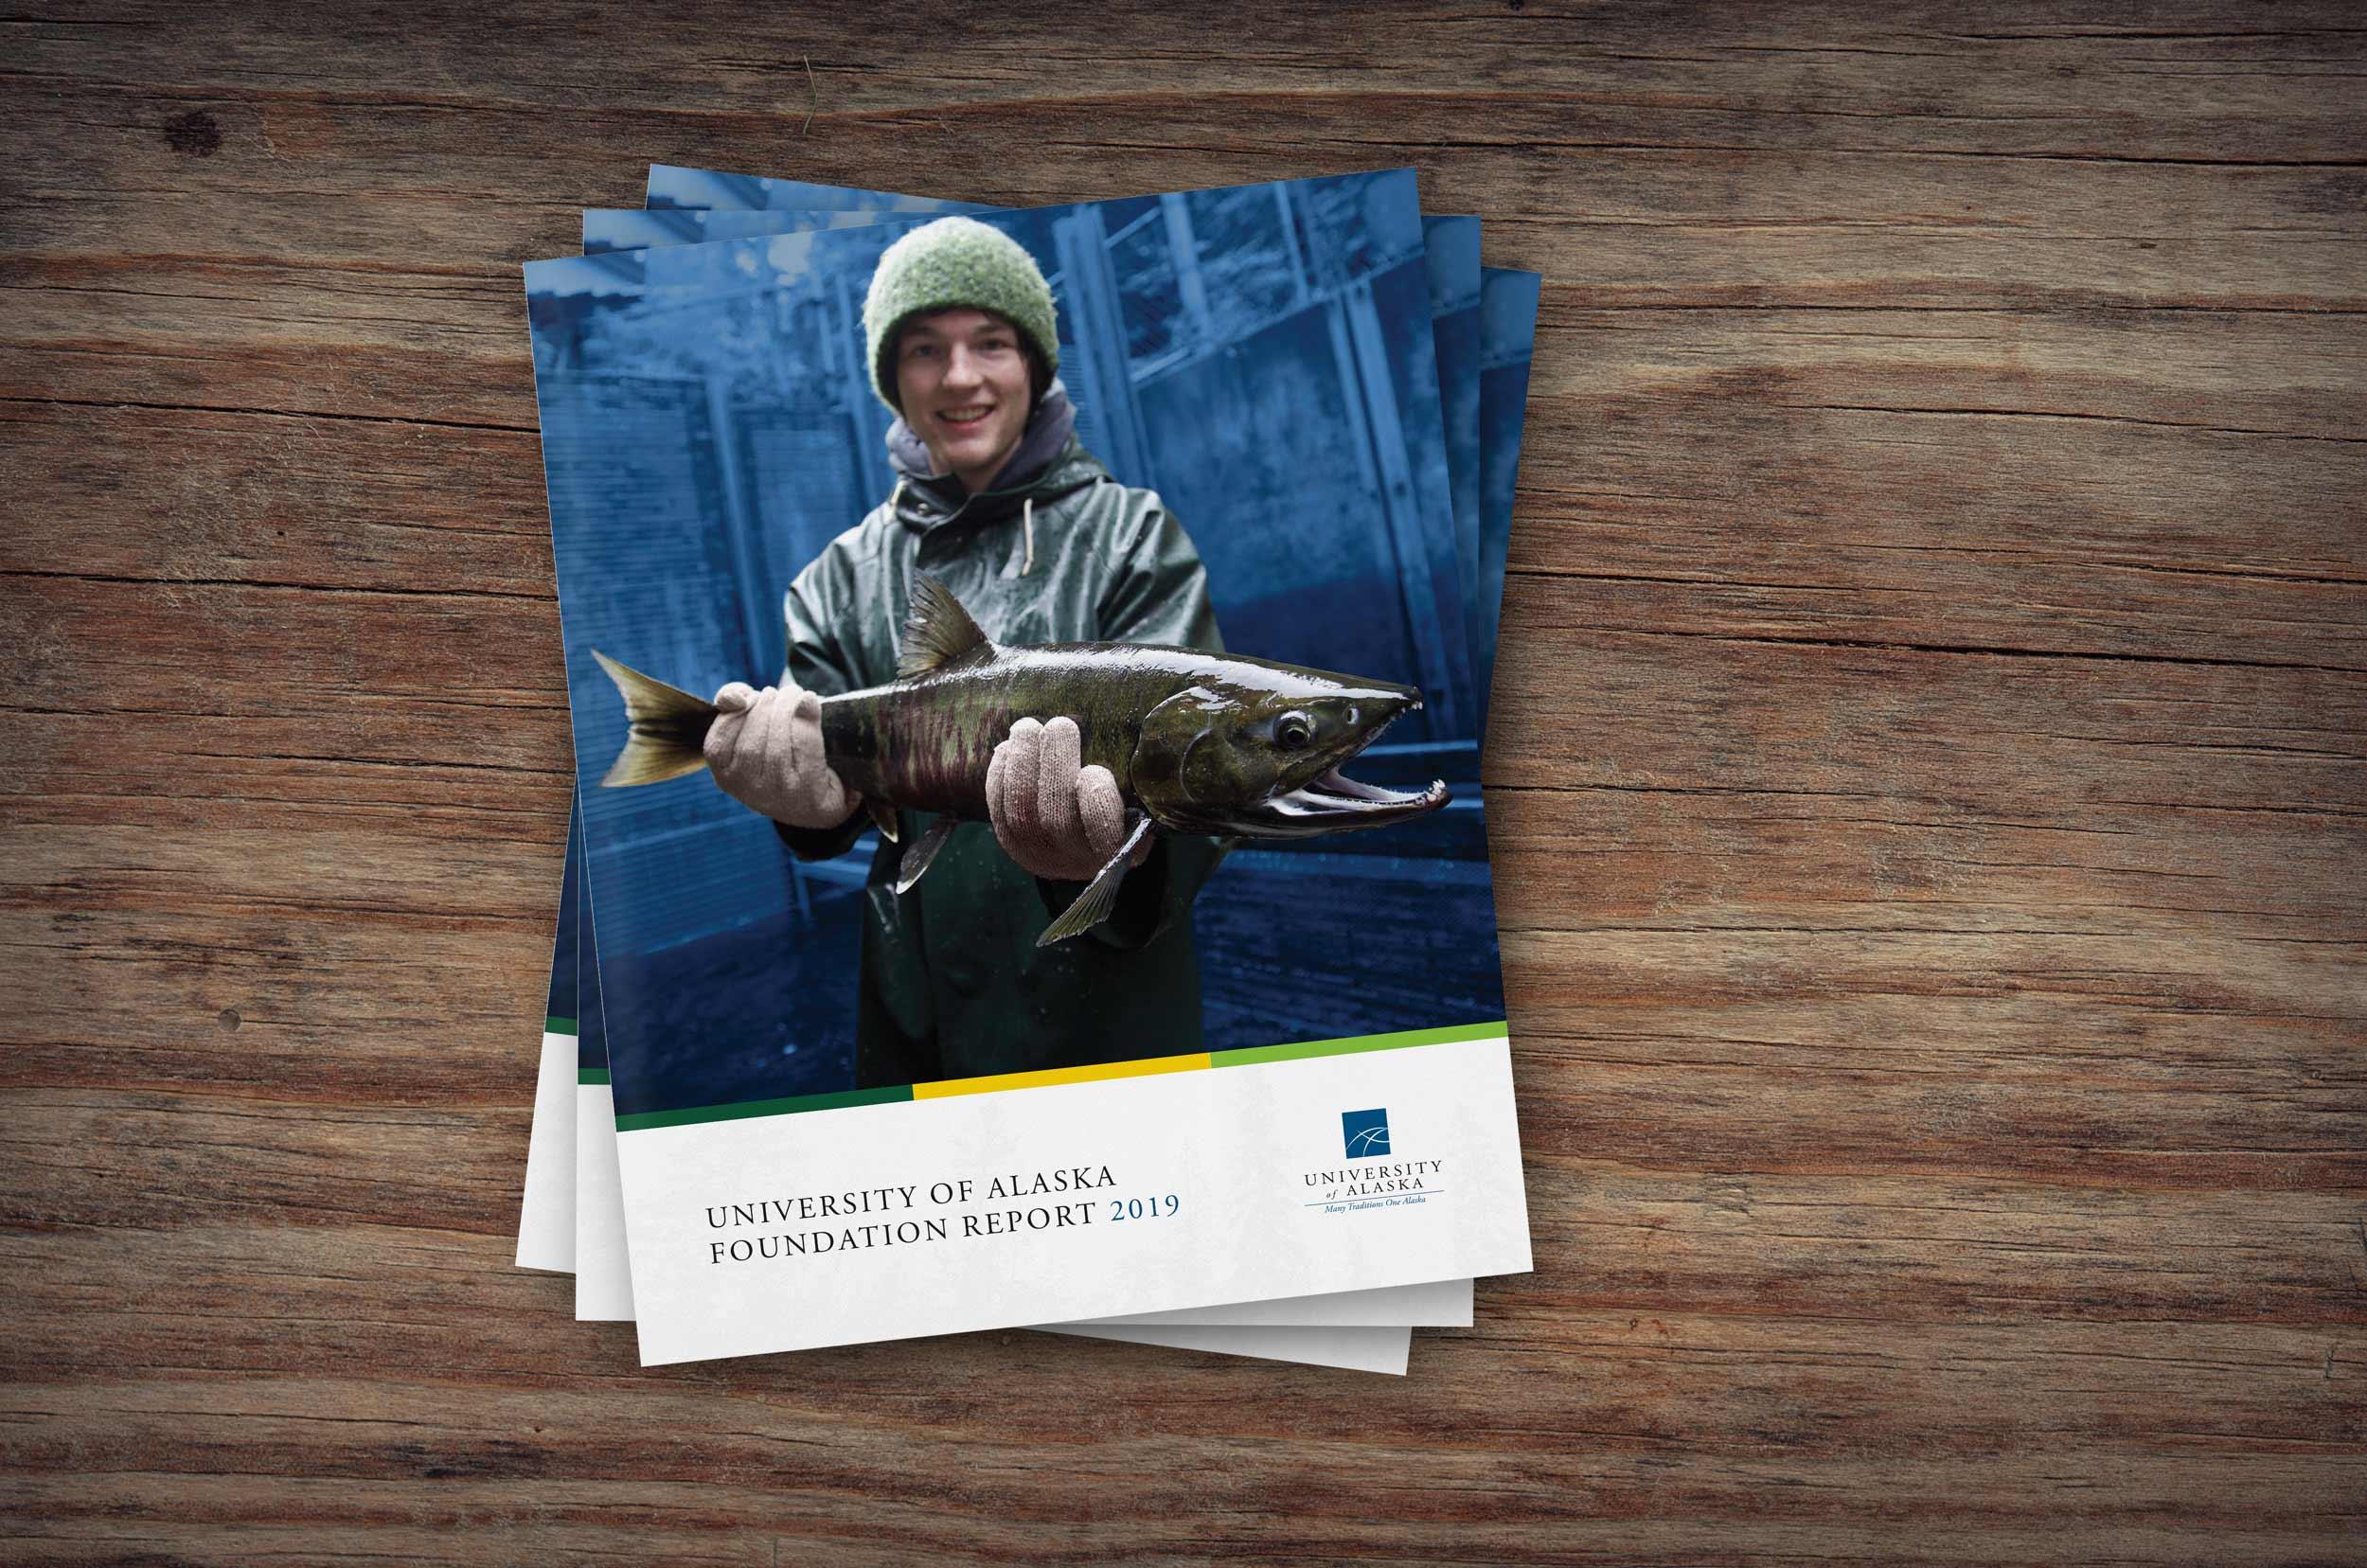 University of Alaska annual report cover